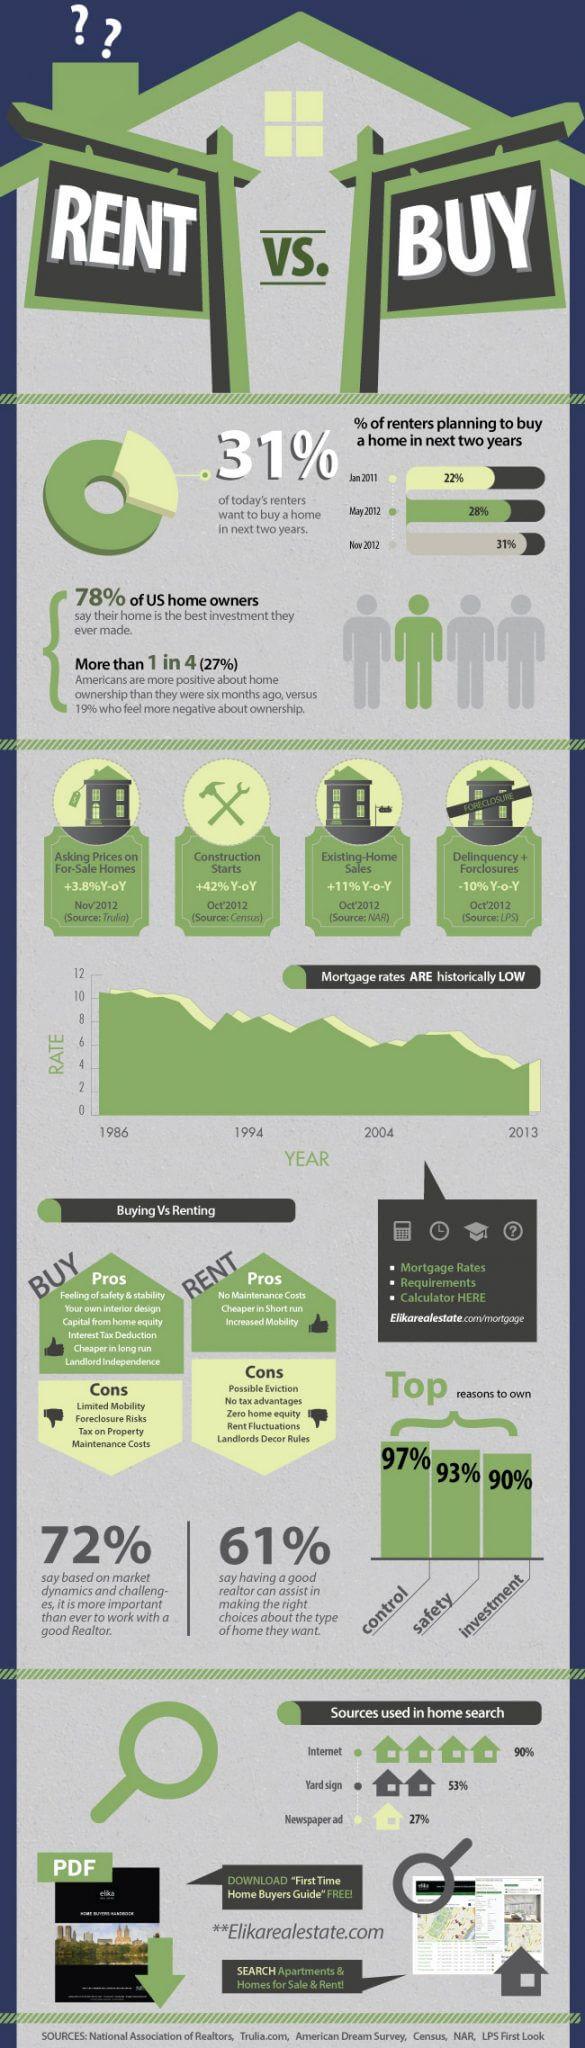 rent-vs-buy-home-infographic